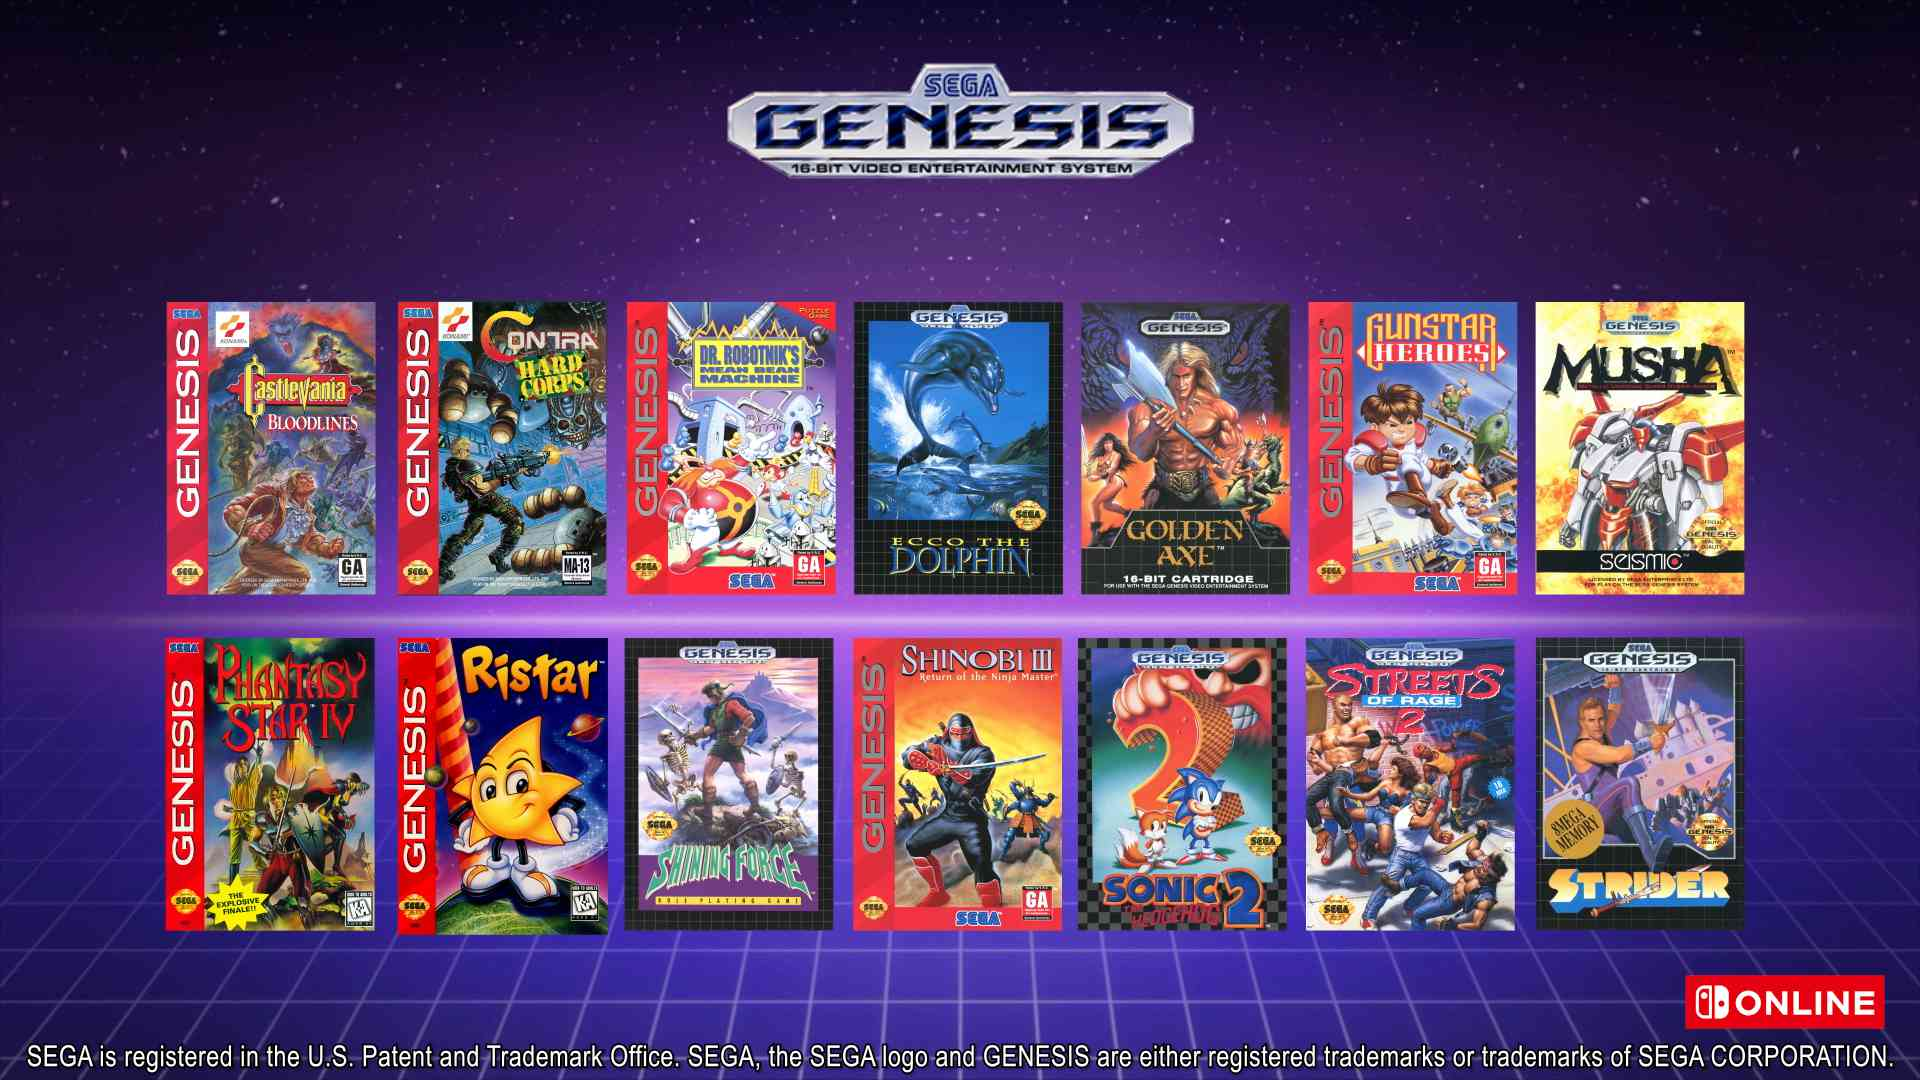 Switch Online Sega Genesis library